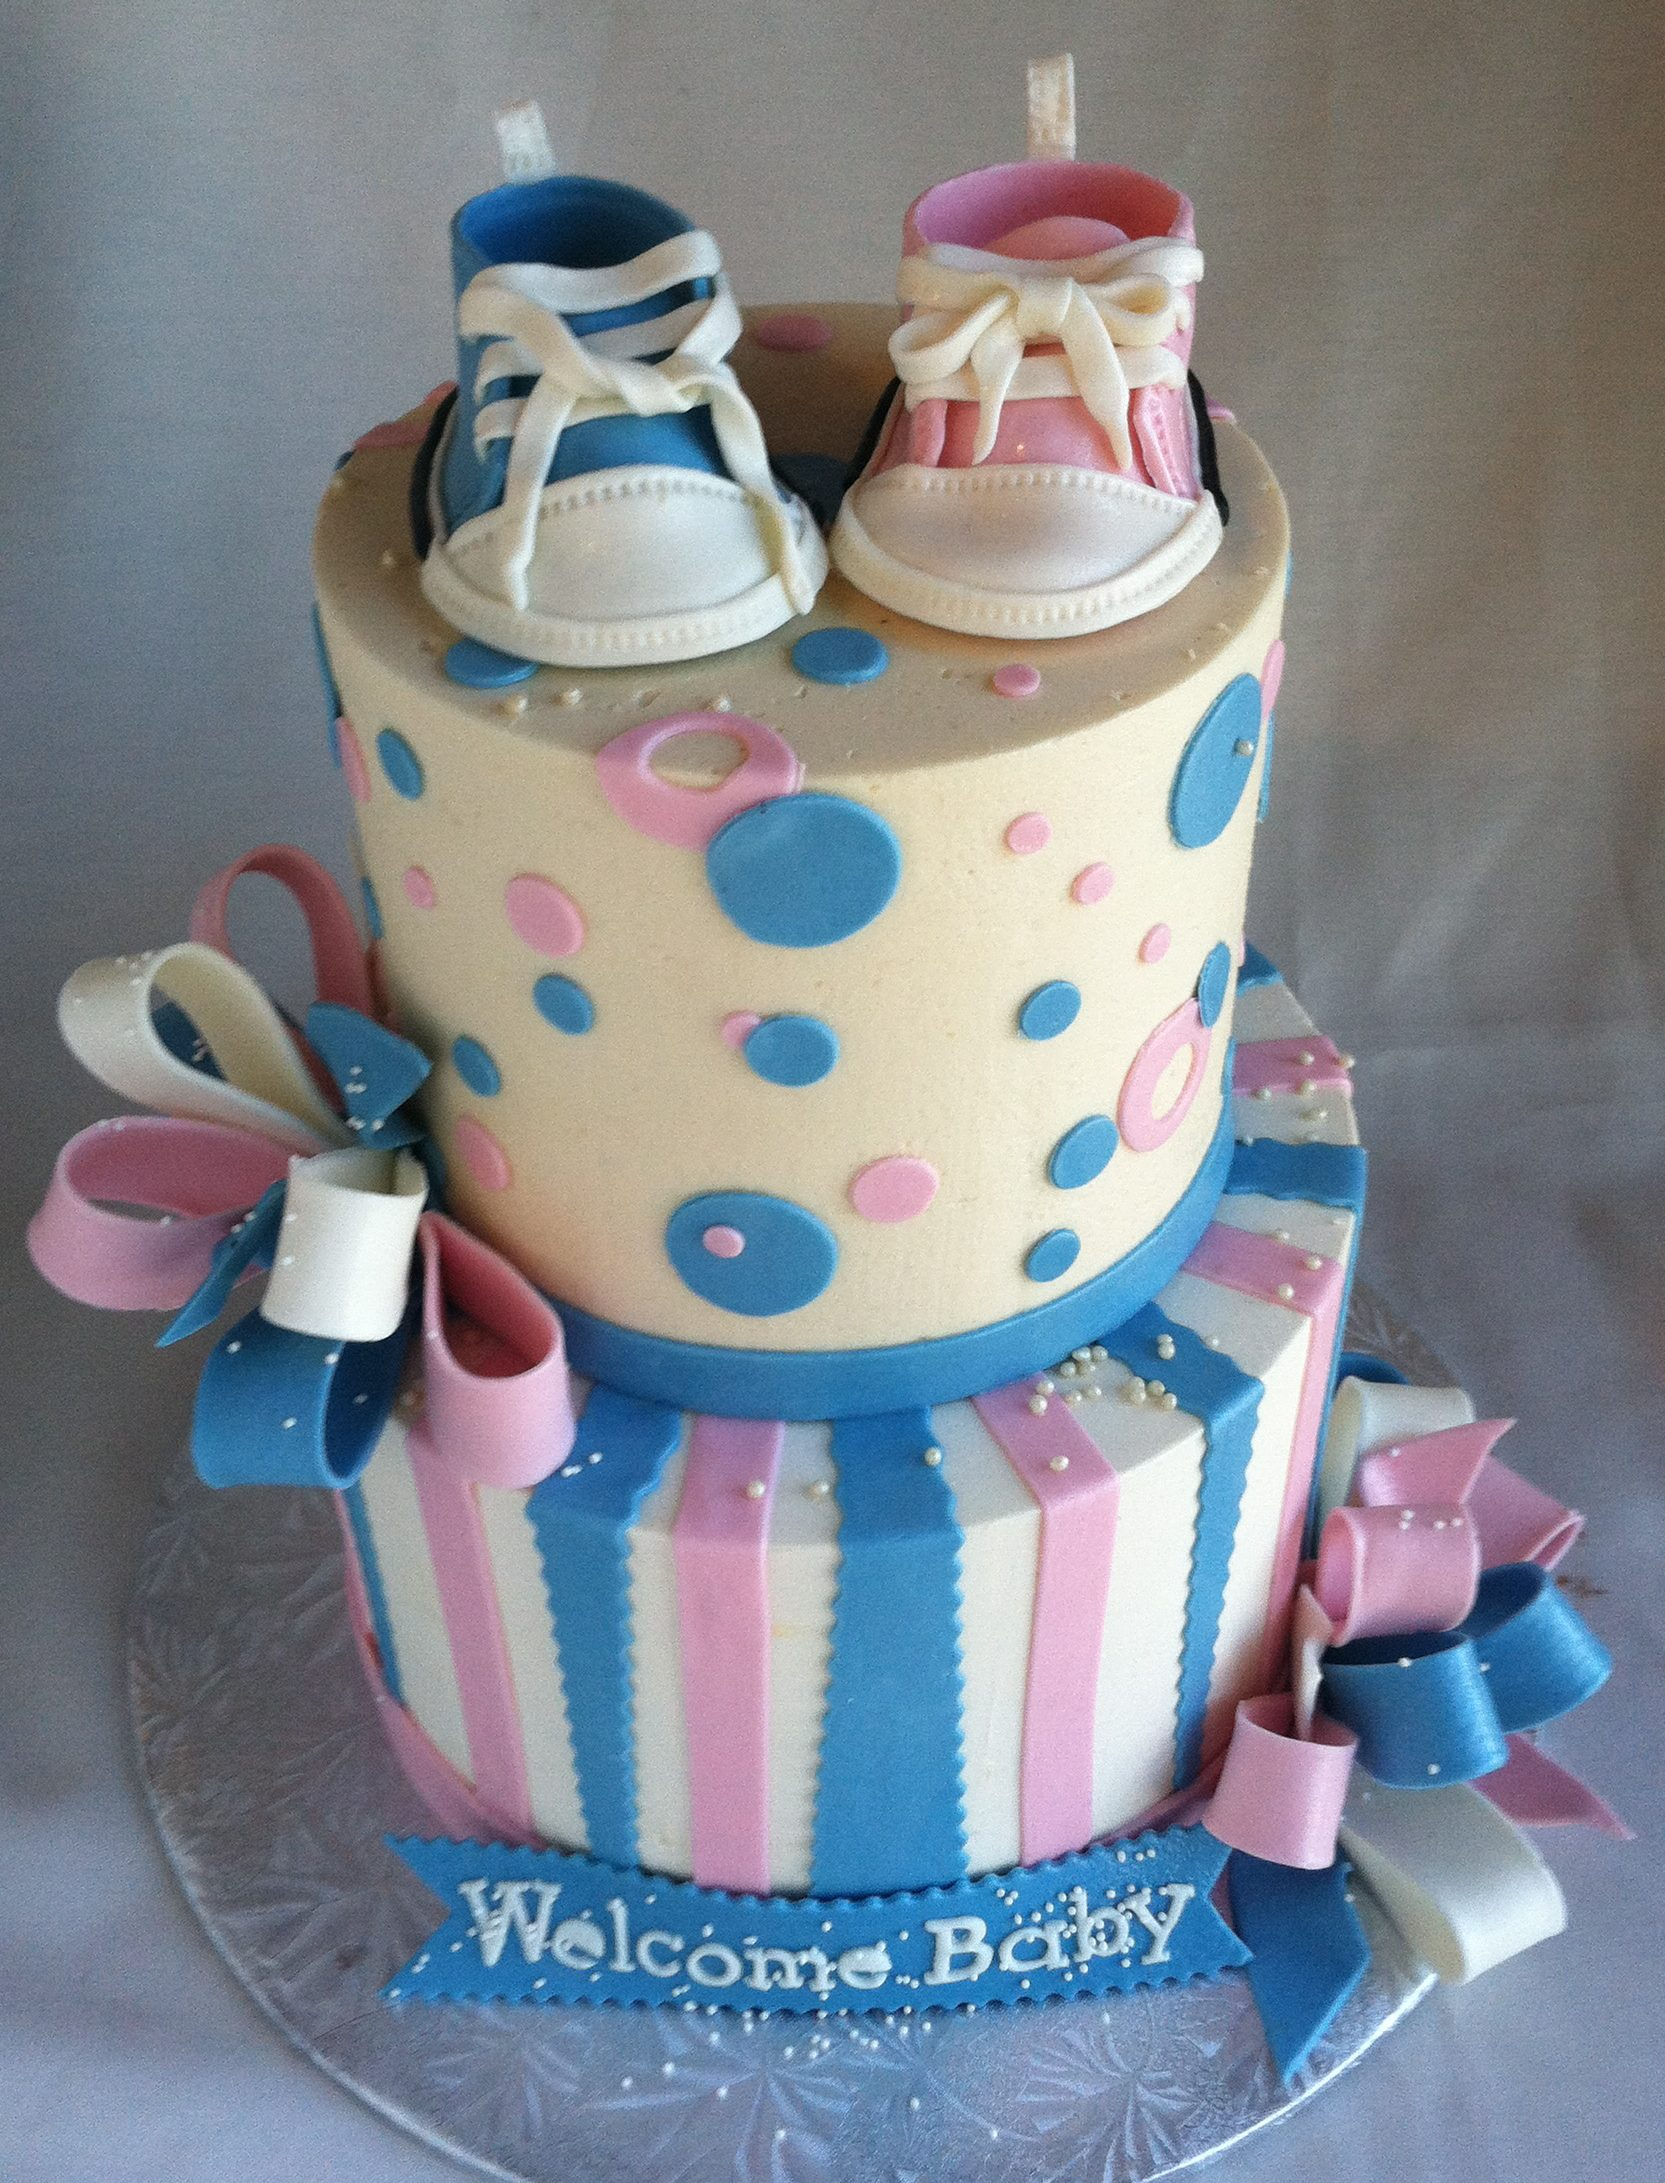 shower cakes peter rabbit cake ballet shoe baby shower cake western